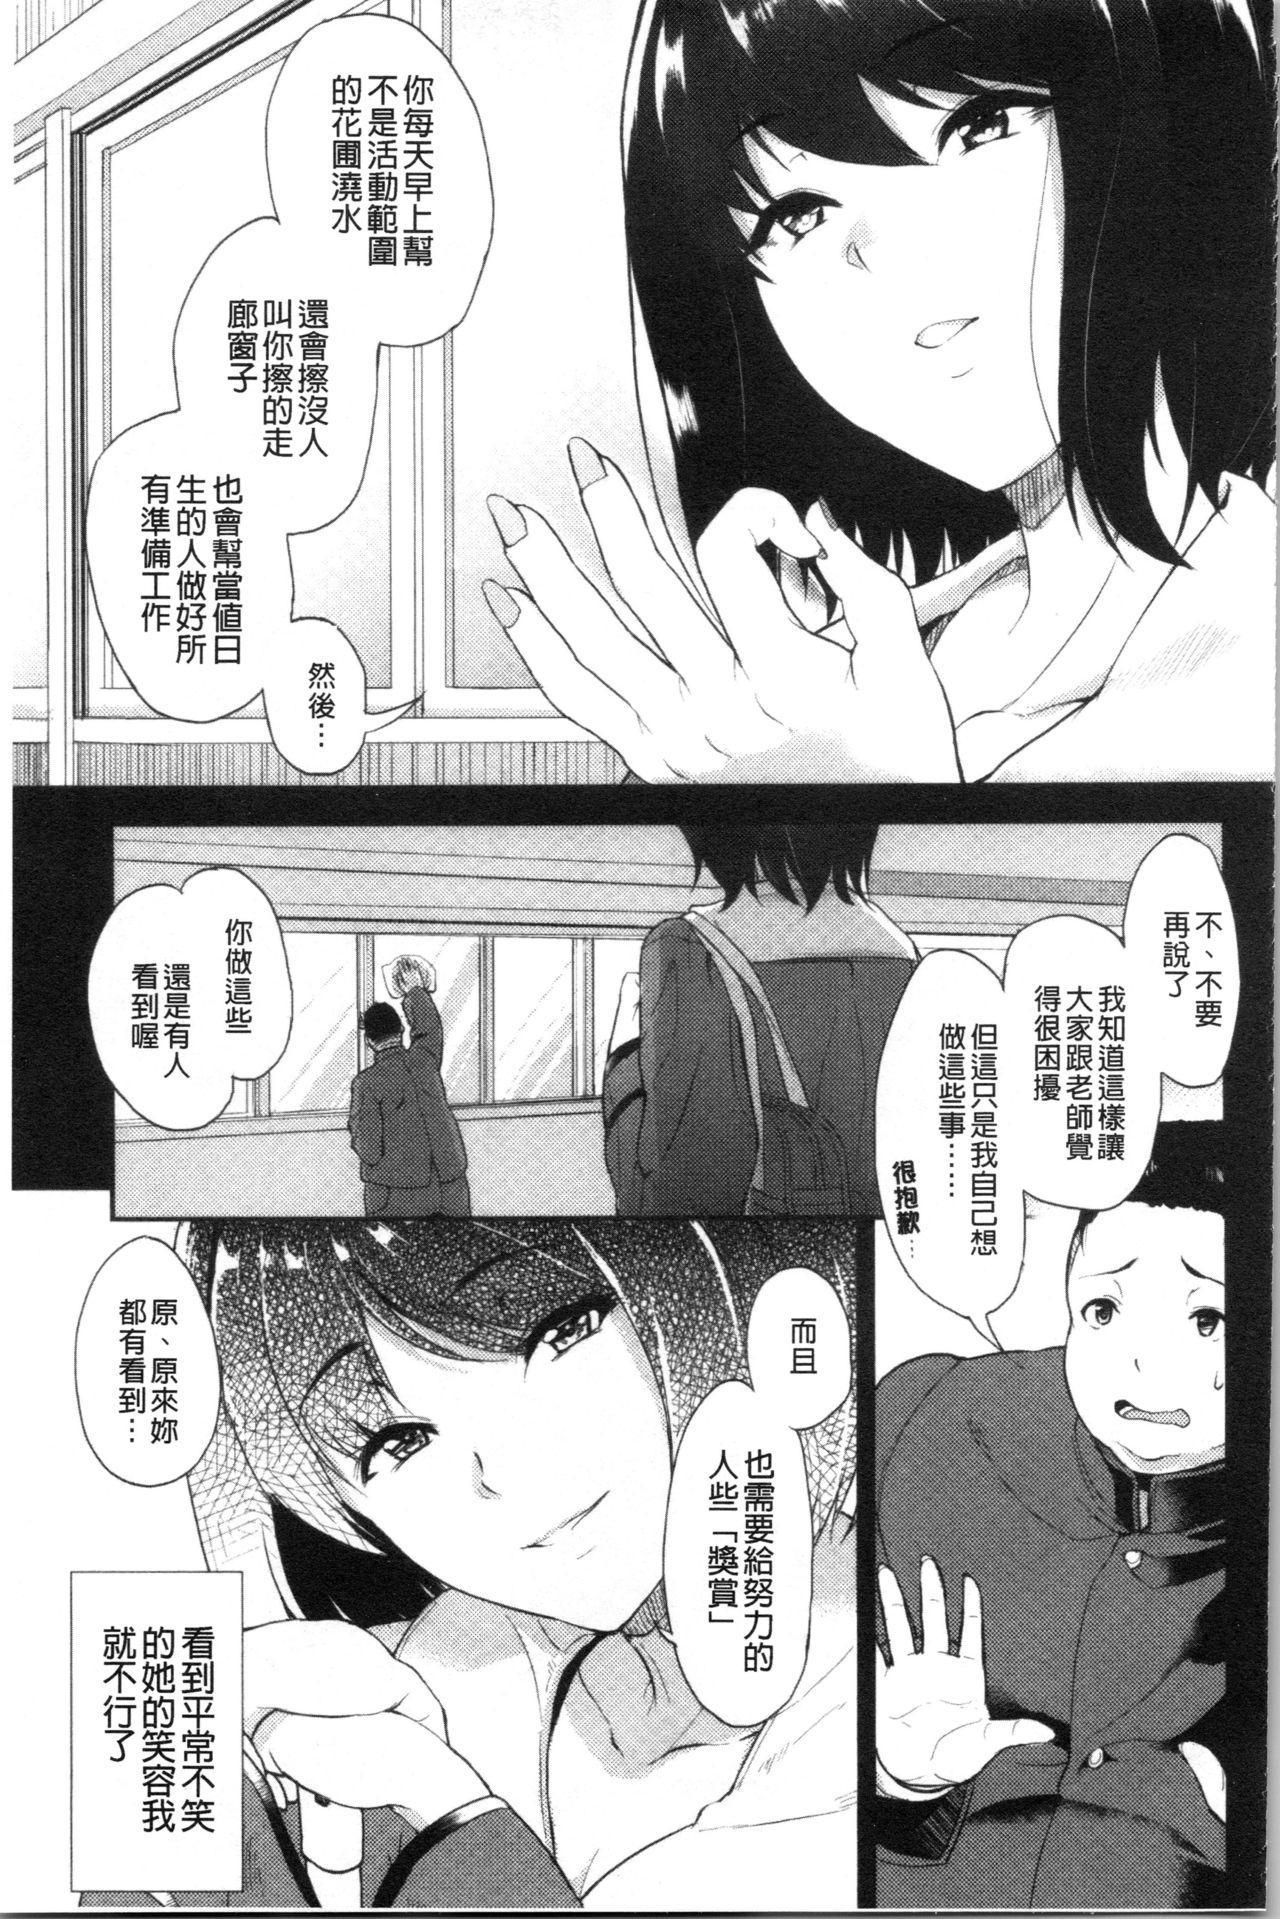 Kanojo ga SEX ni nare teru wake | 女友對激情性愛變很習慣的理由 109